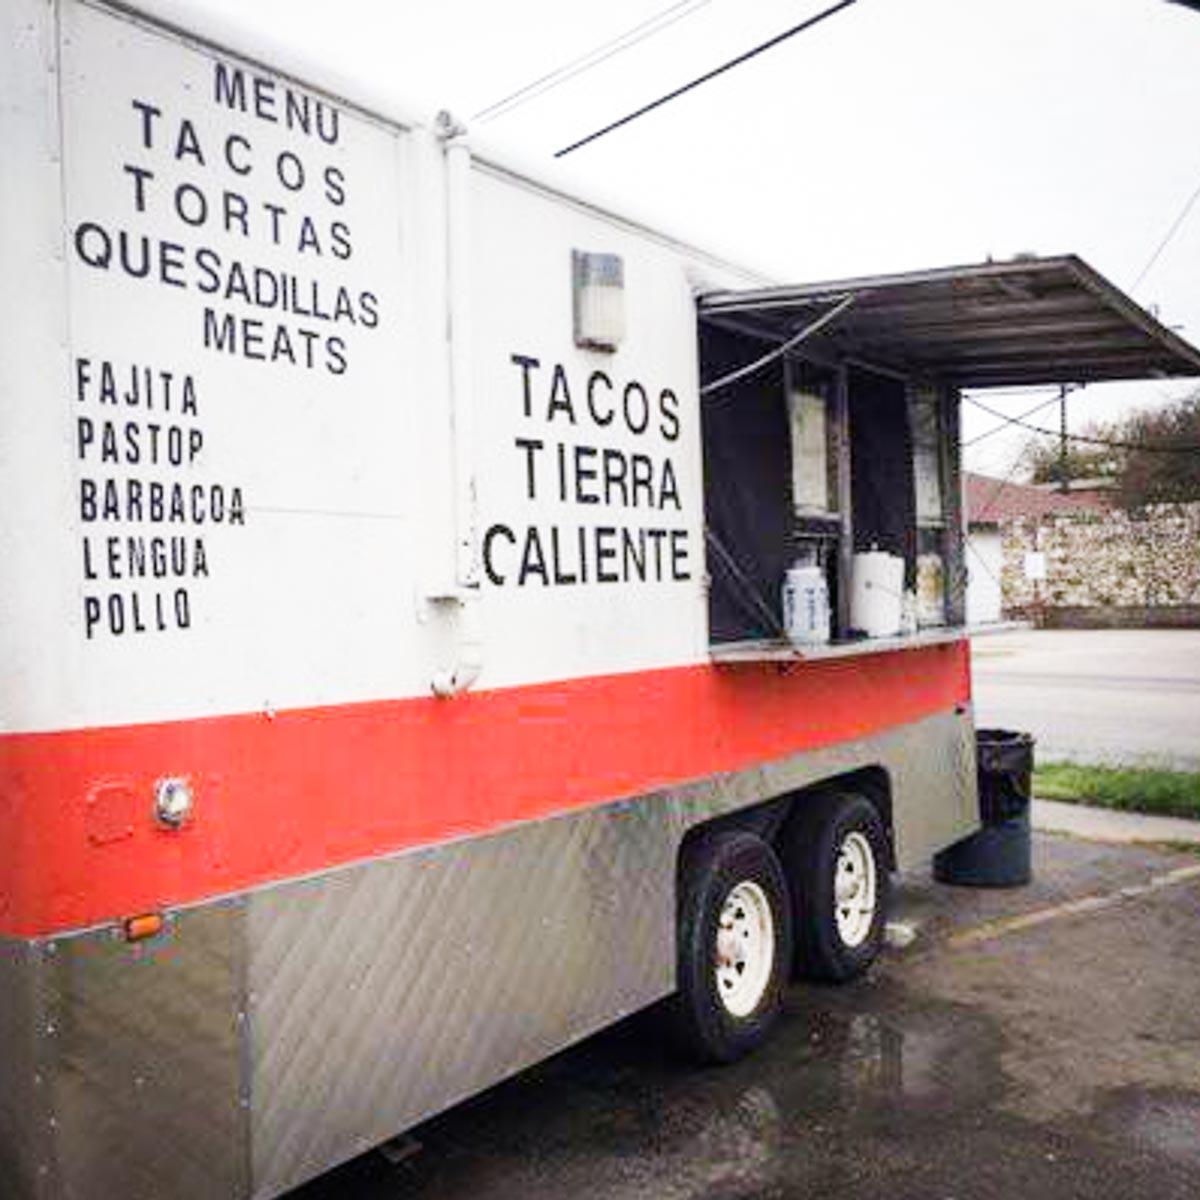 Photograph courtesy of Tacos Tierra Caliente